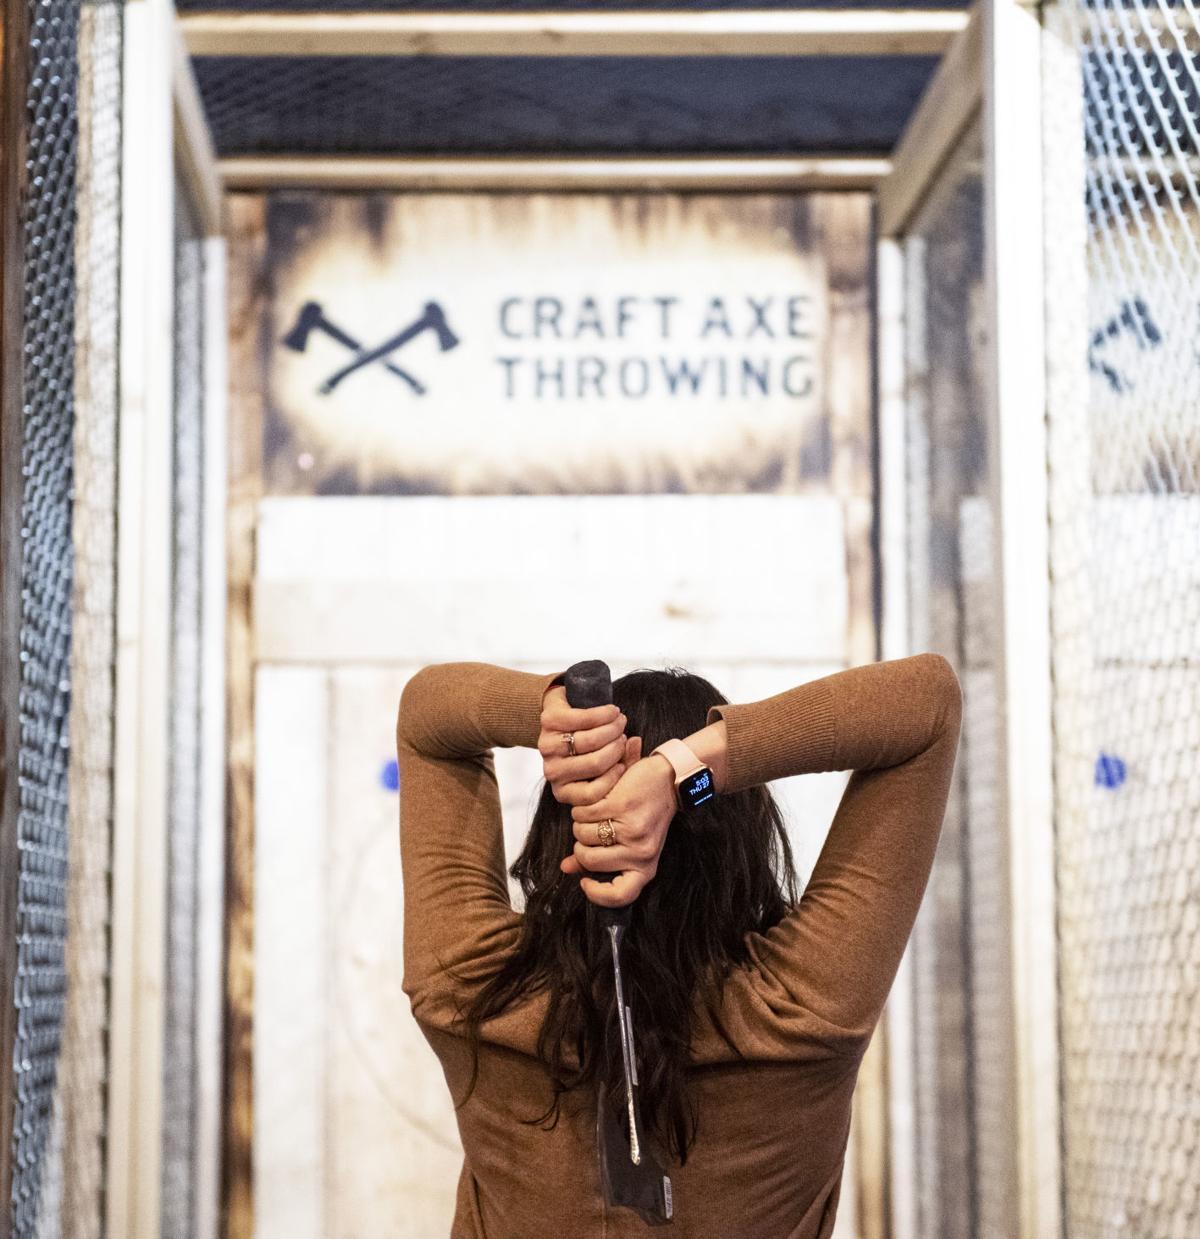 Craft Axe Throwing, 12.27